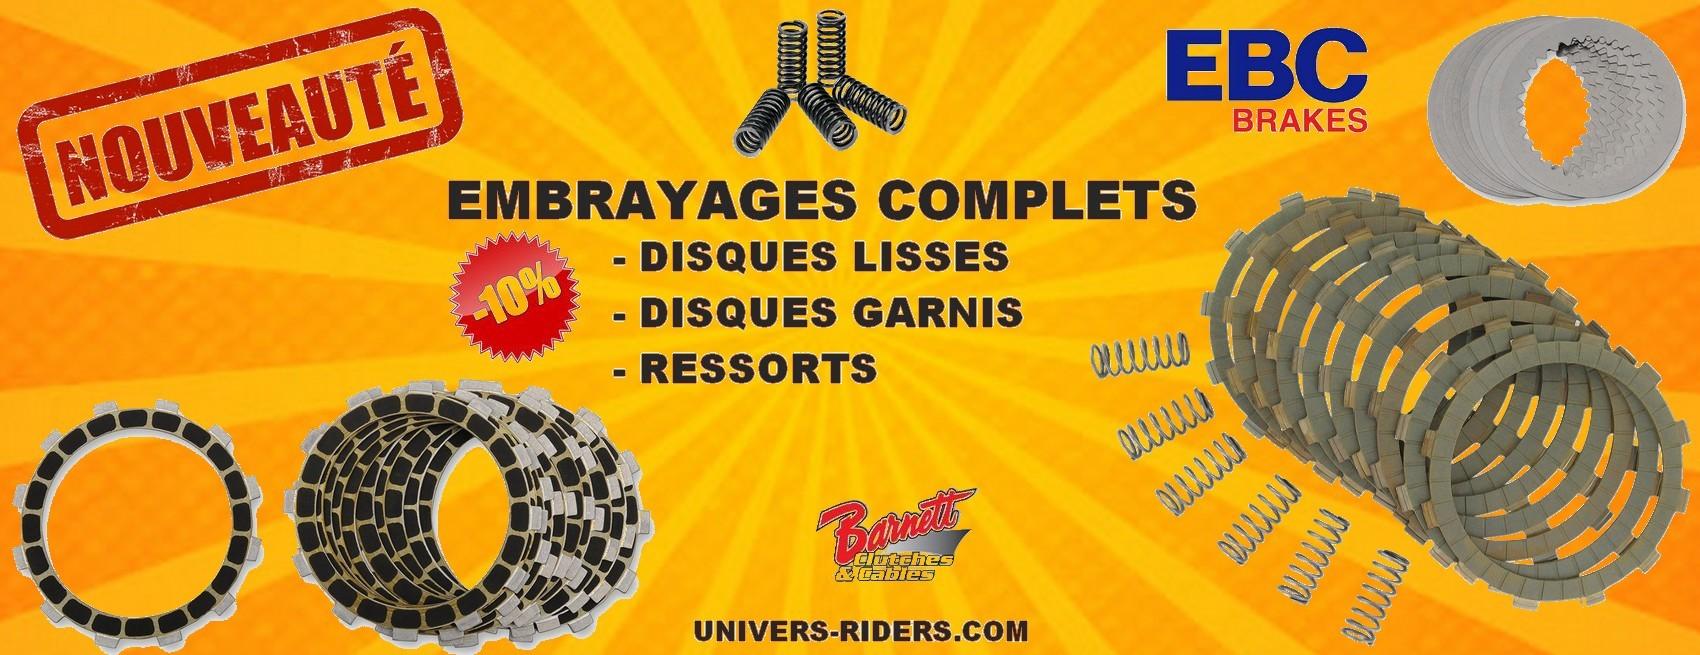 Embrayages ebc Motos Univers Riders